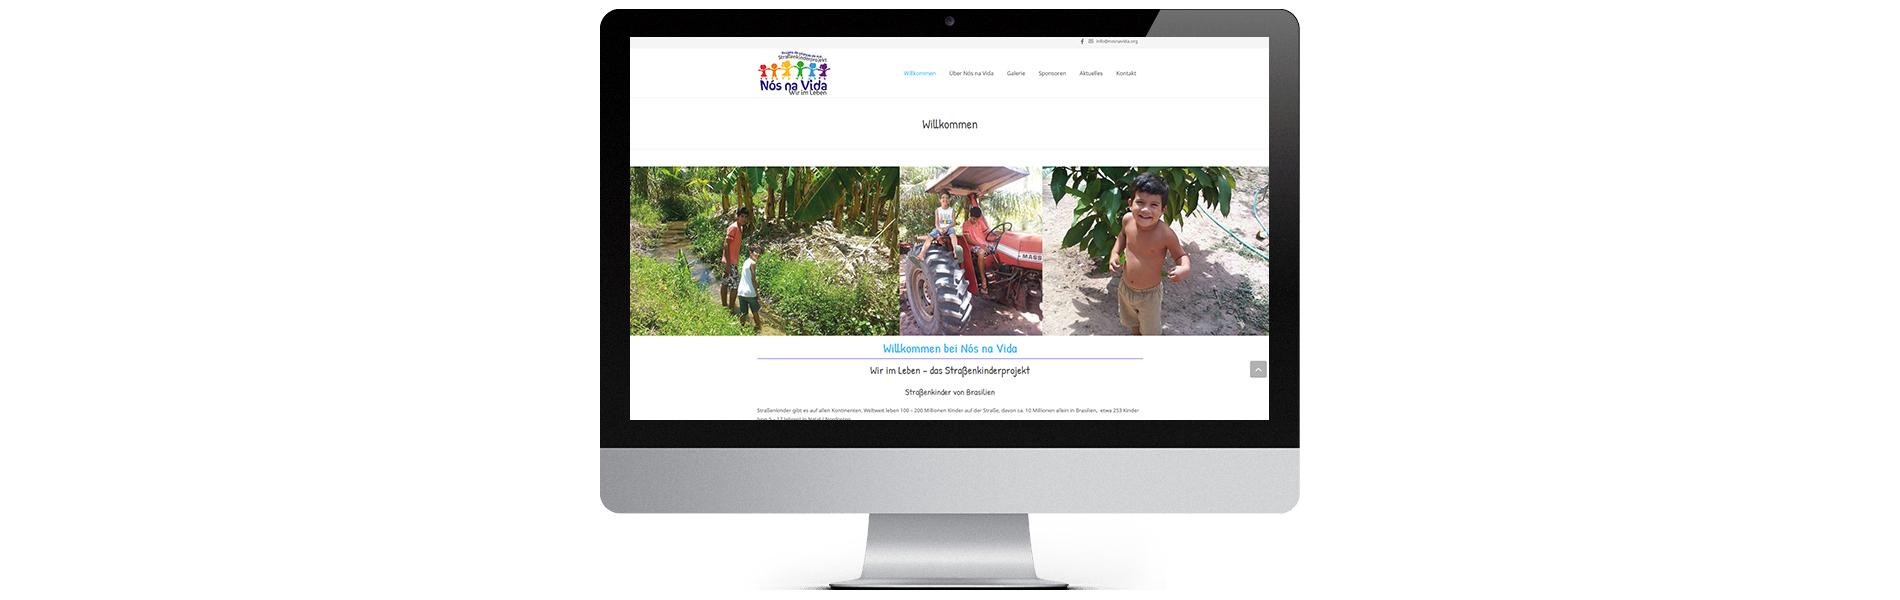 Projekt: mehrsprachige Website Nos na Vida